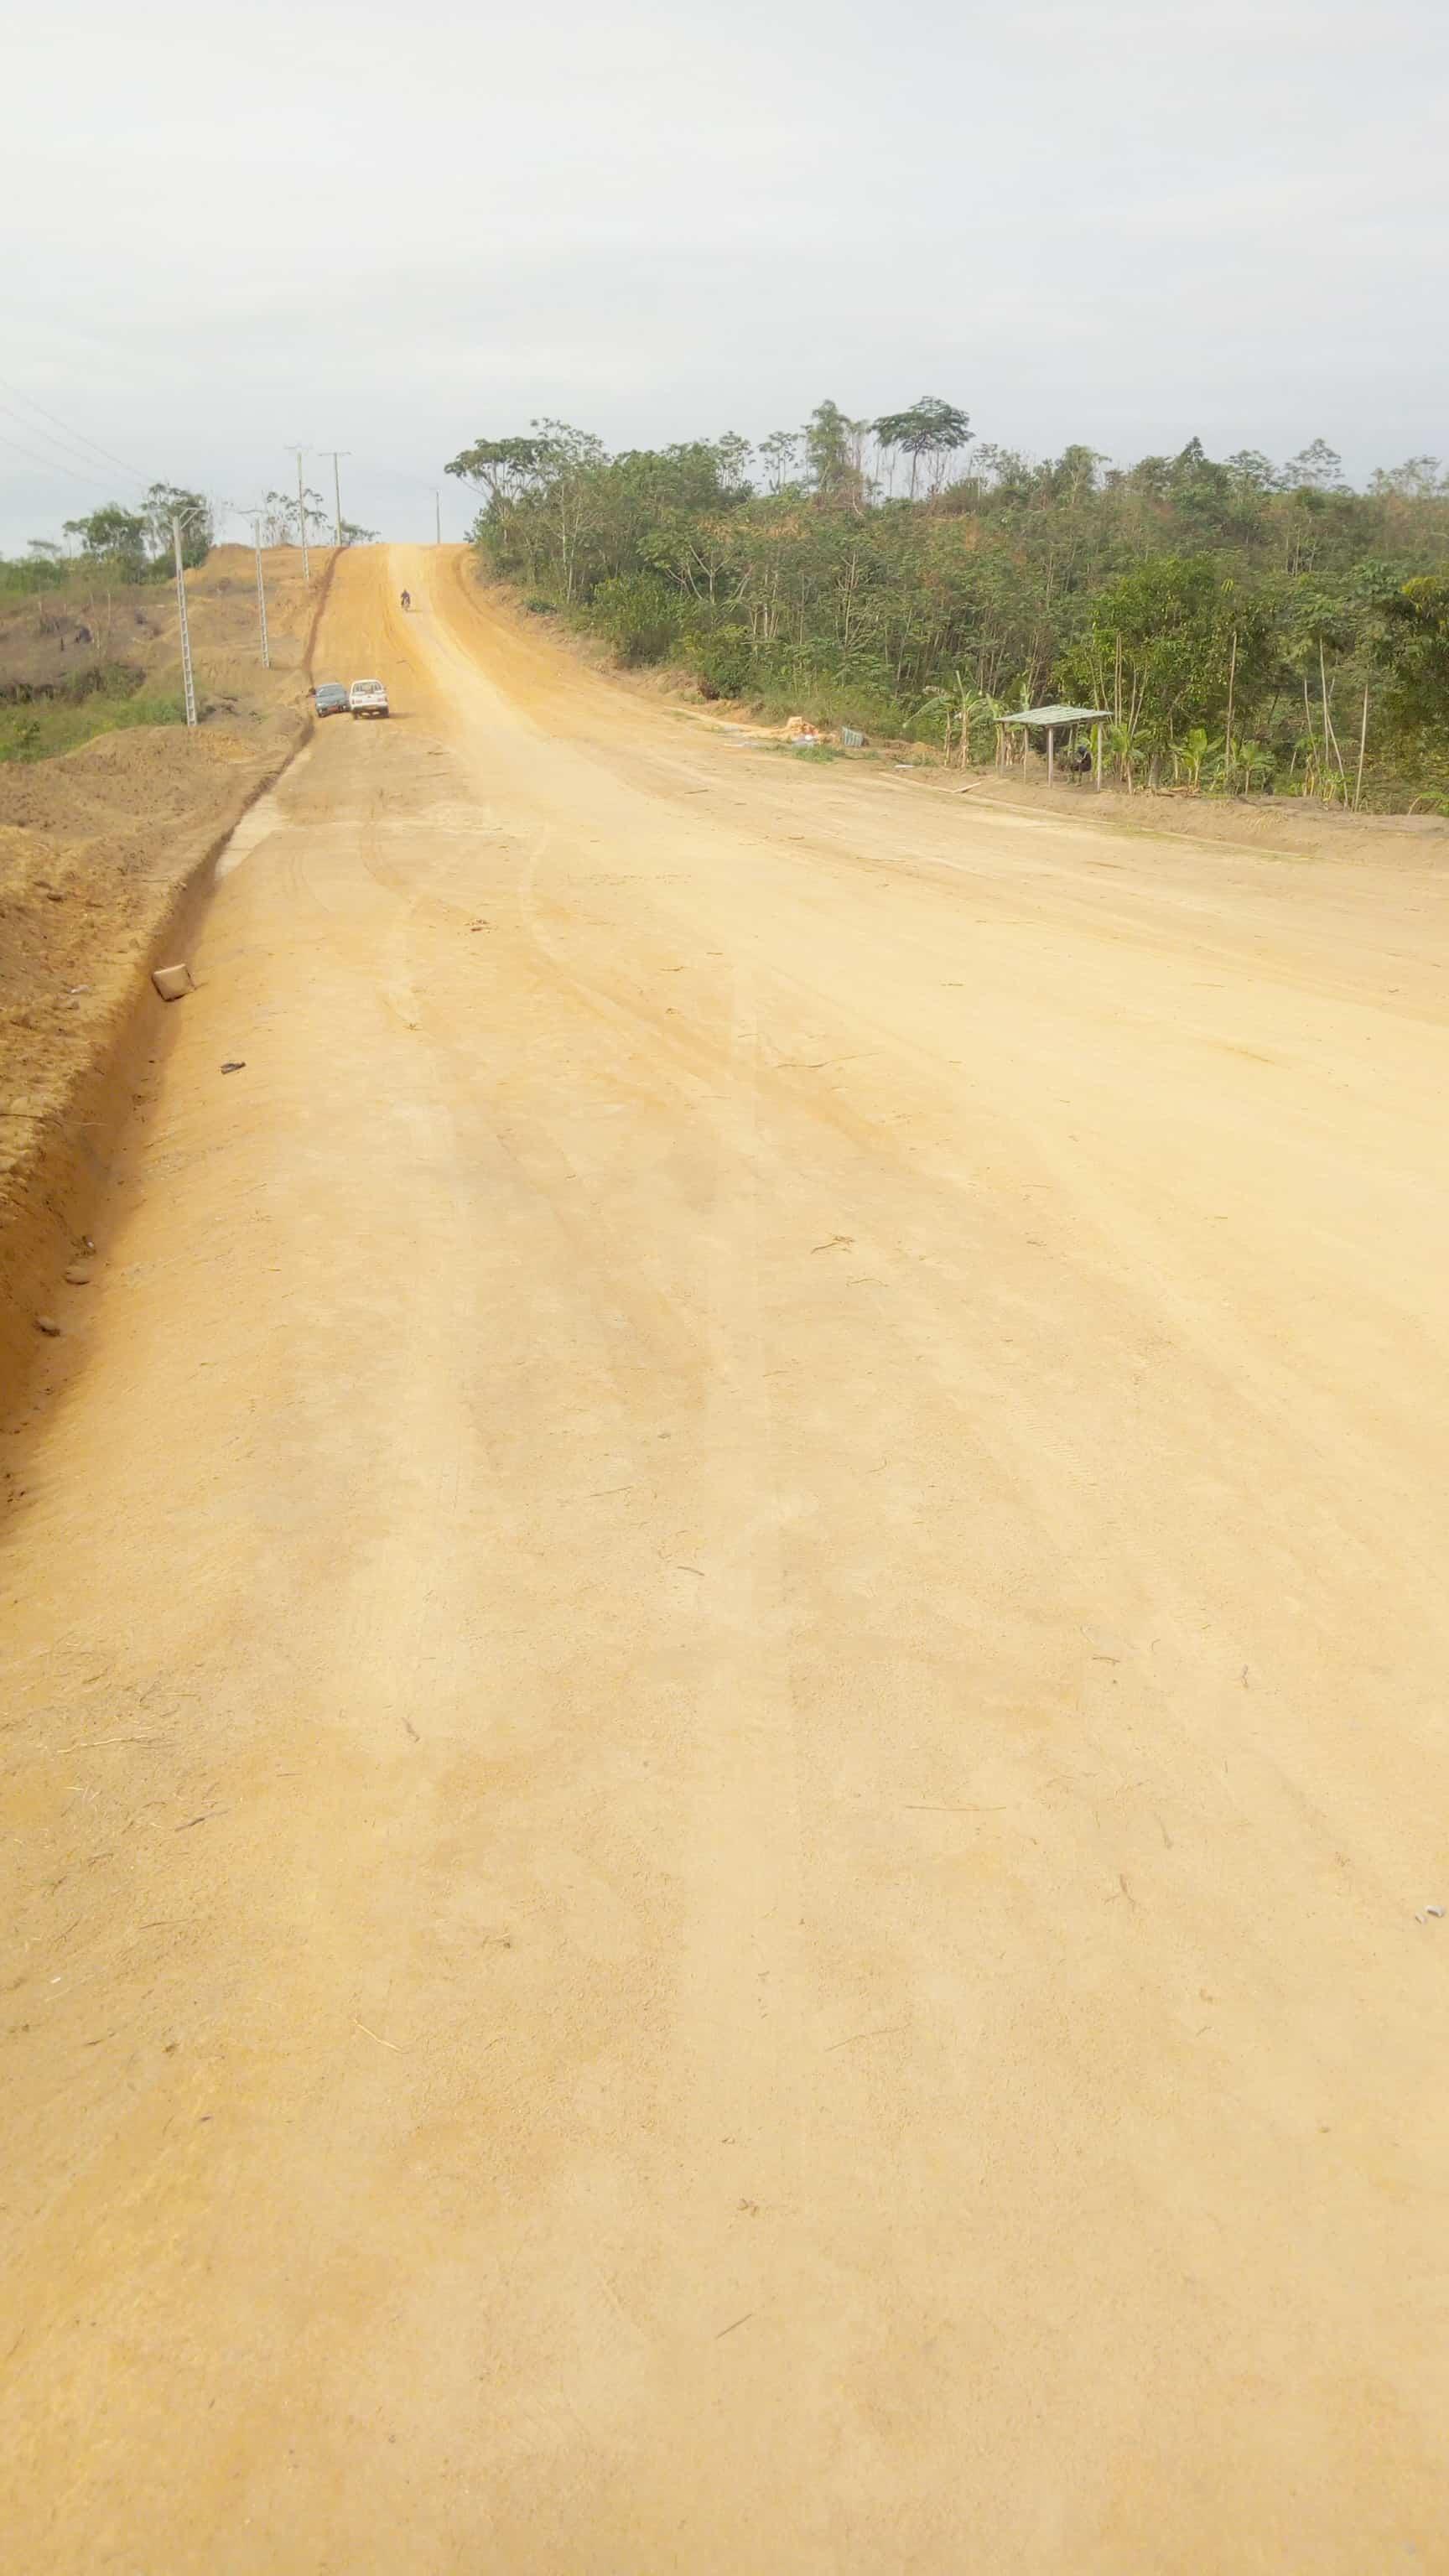 Land for sale at Douala, Bassa, Lendi logement canadien - 300000 m2 - 6 000 000 FCFA